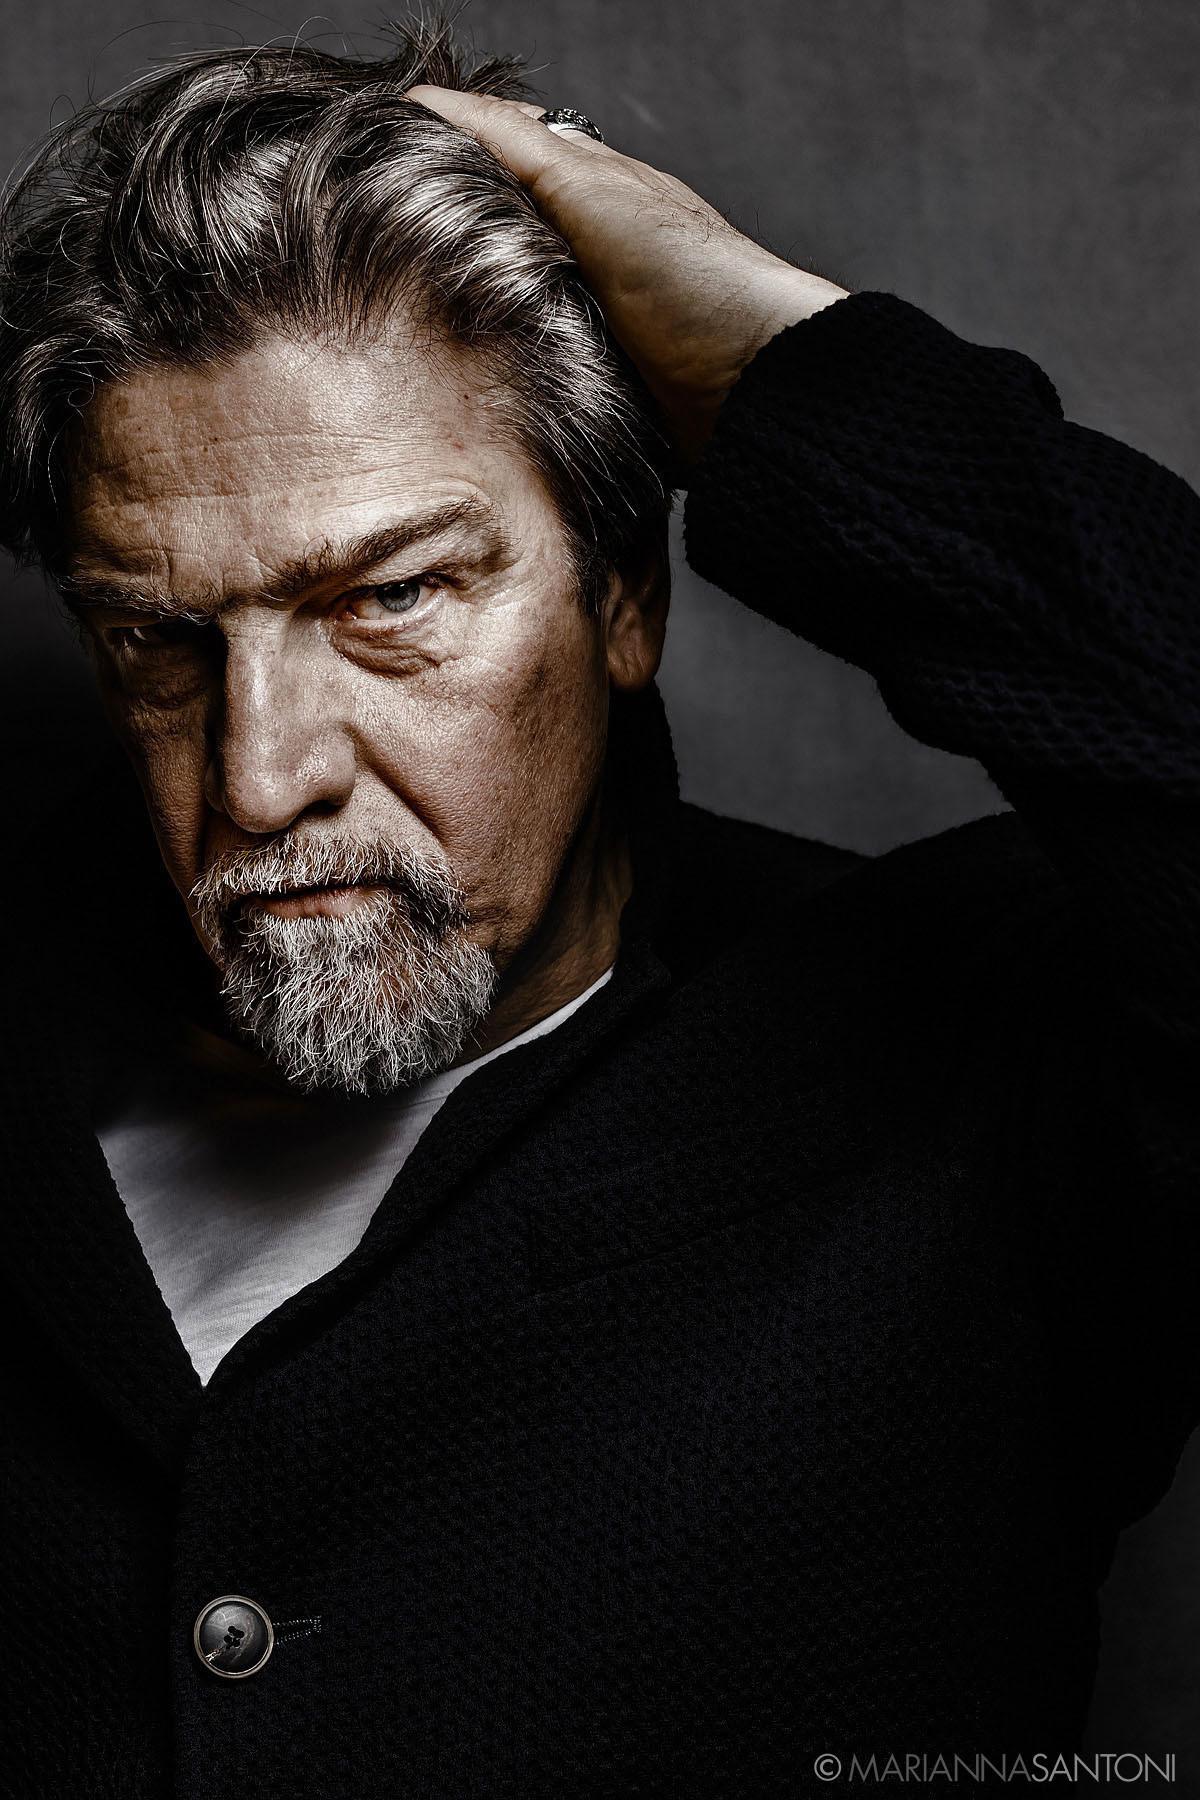 portrait of the actor Fabio Santor shot by photographer marianna santoni